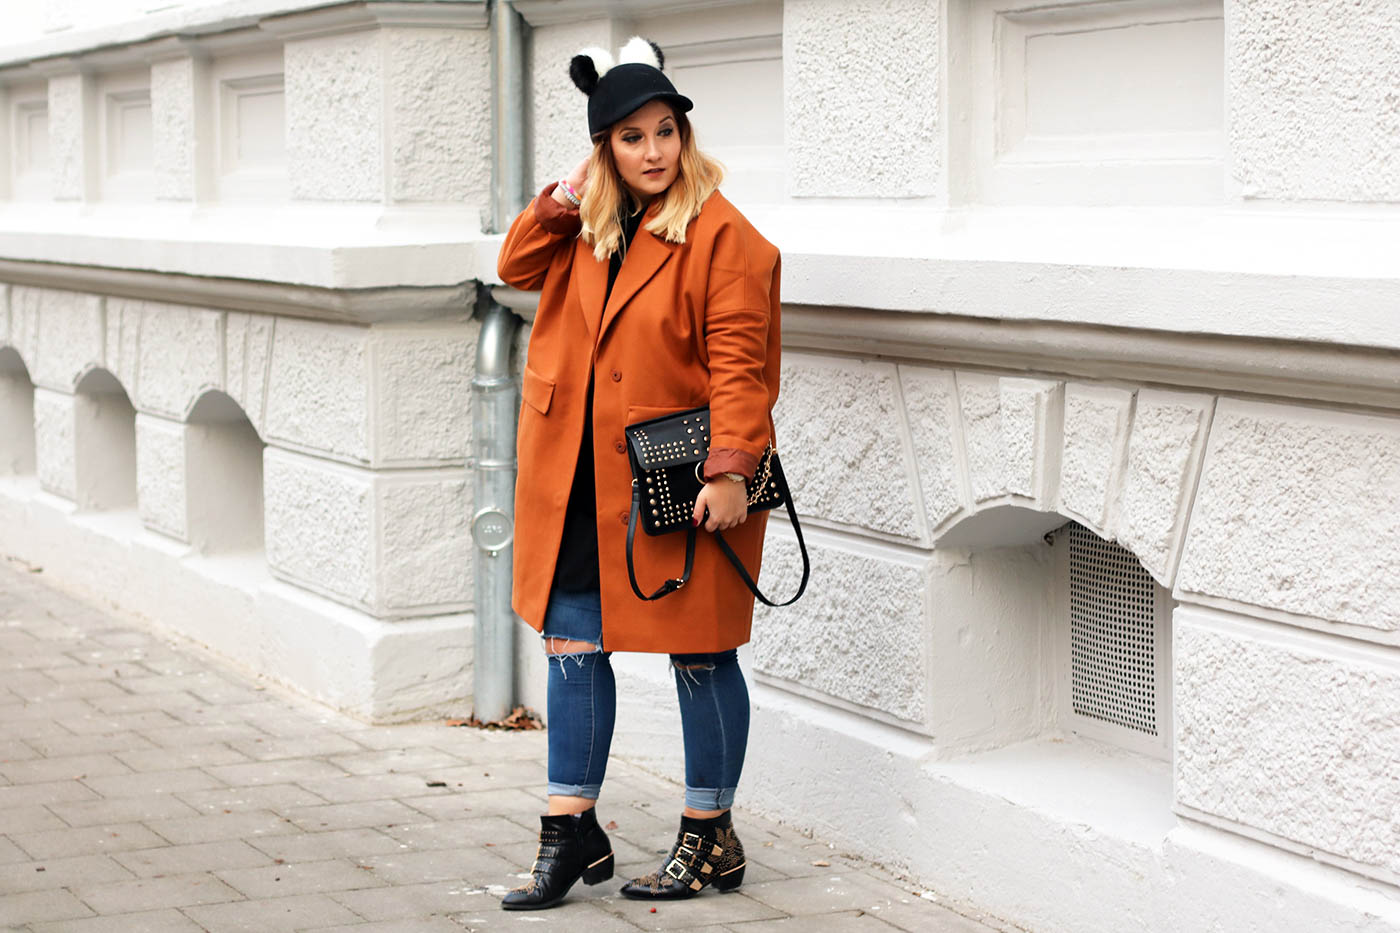 outfit-look-style-mantel-cappe-fashionblog-modeblog-gewinnspiel7